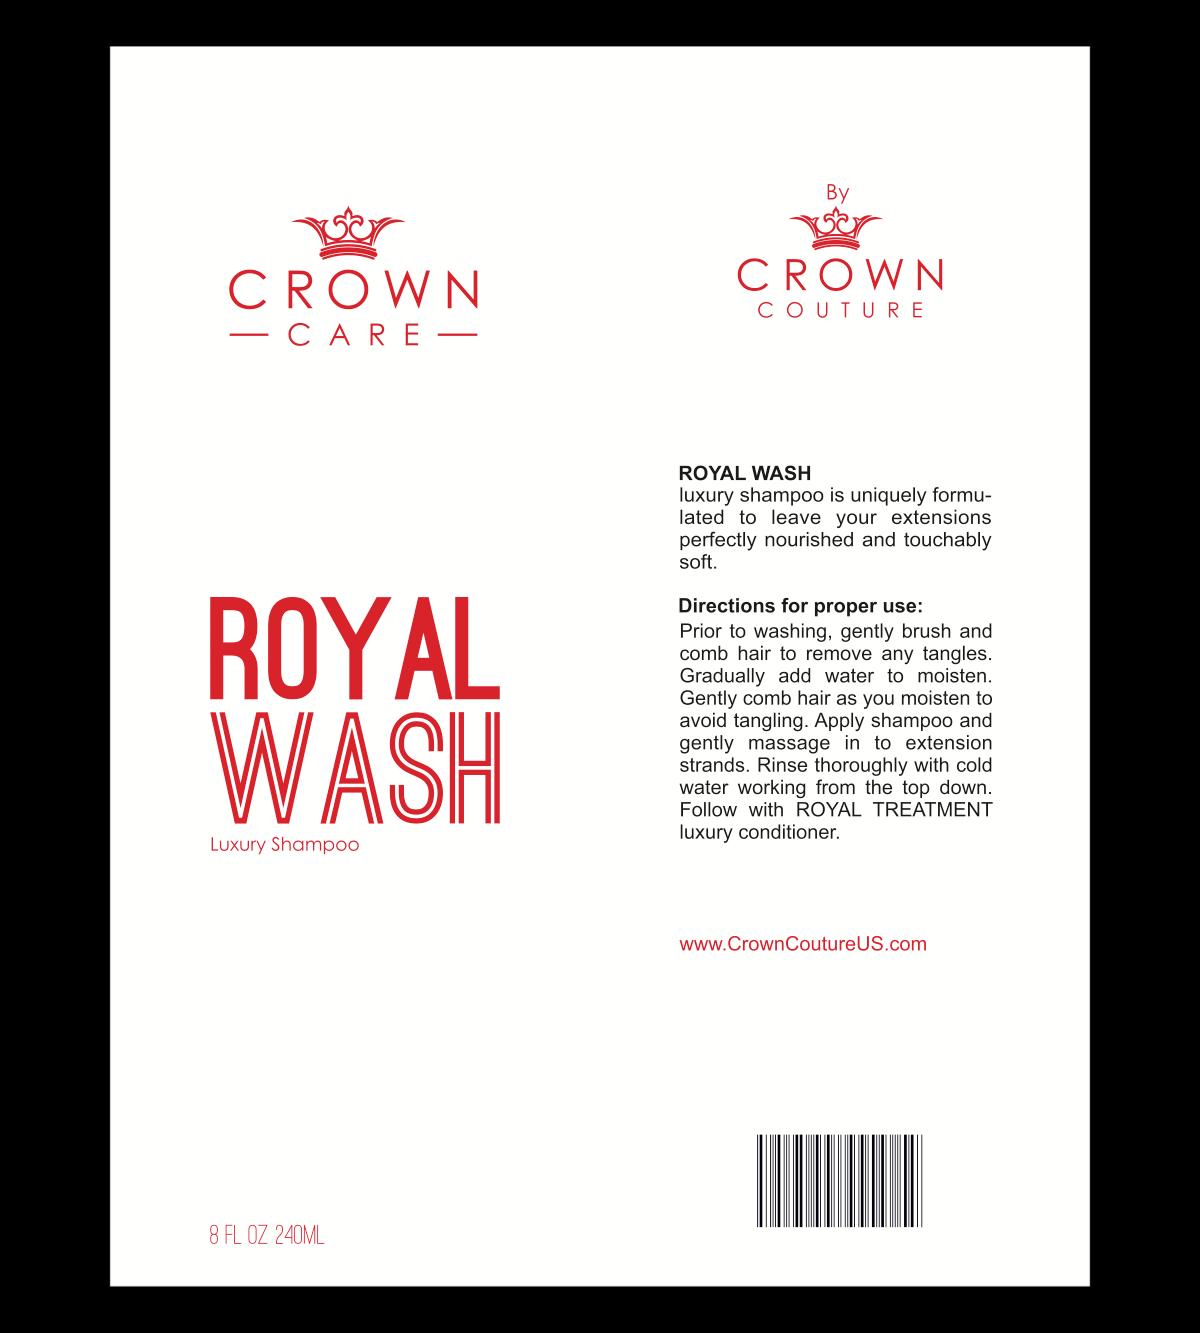 Crown Couture Nashville product line label changes